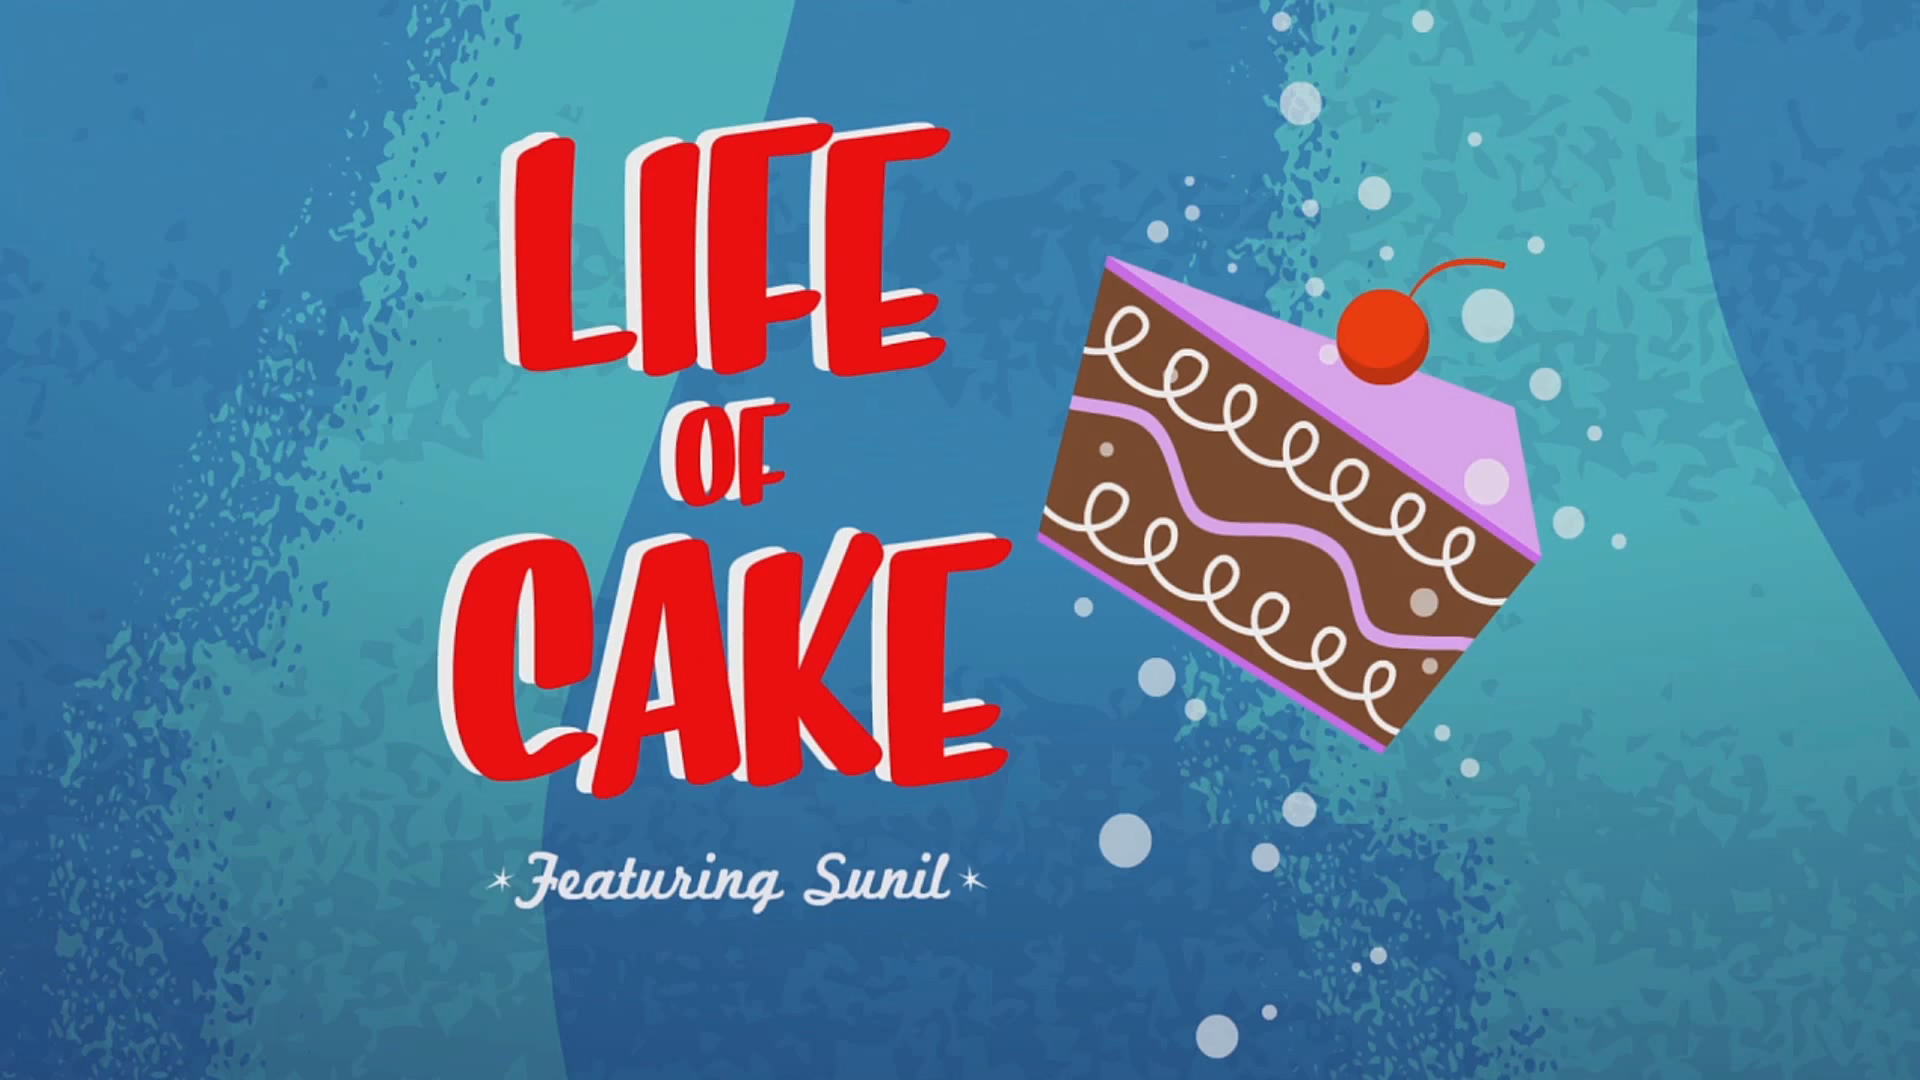 Life of Cake